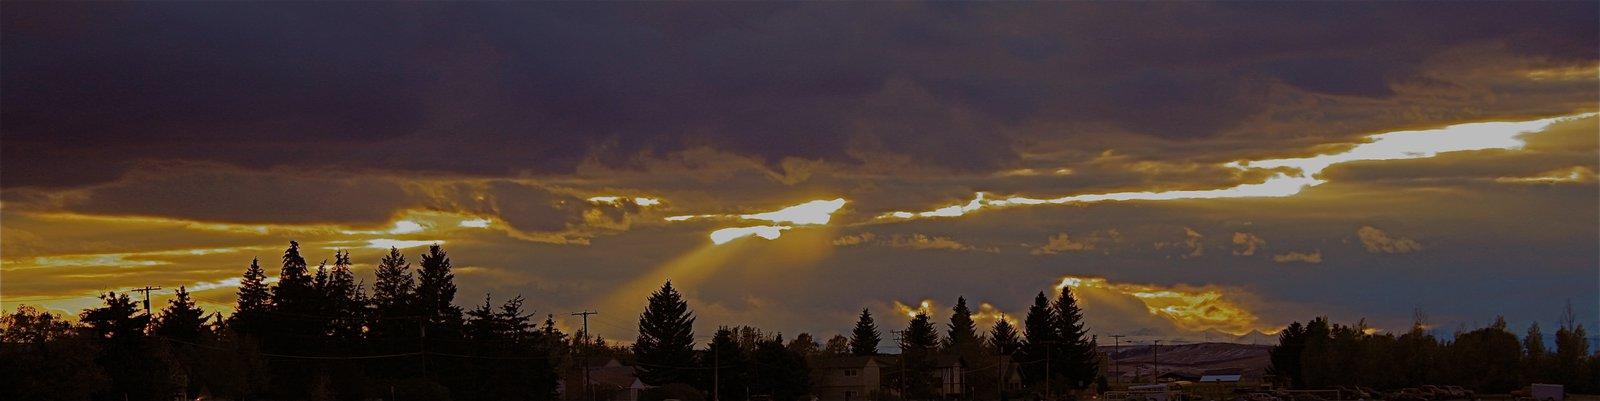 Sick Bozeman Sunset